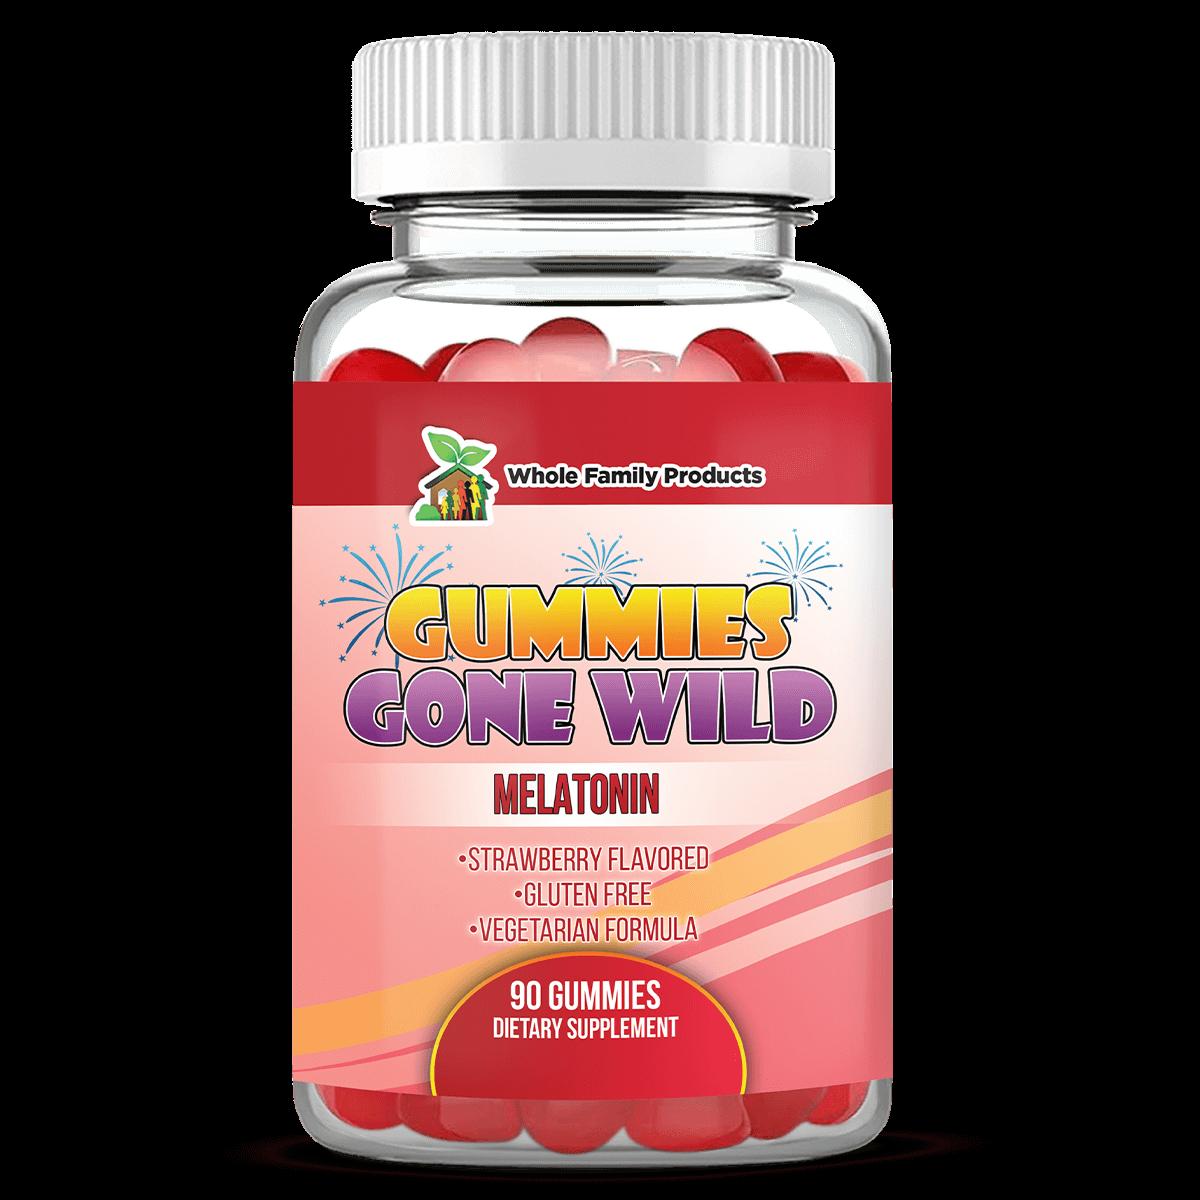 Gummies Gone Wild Melatonin Supplement Gummies